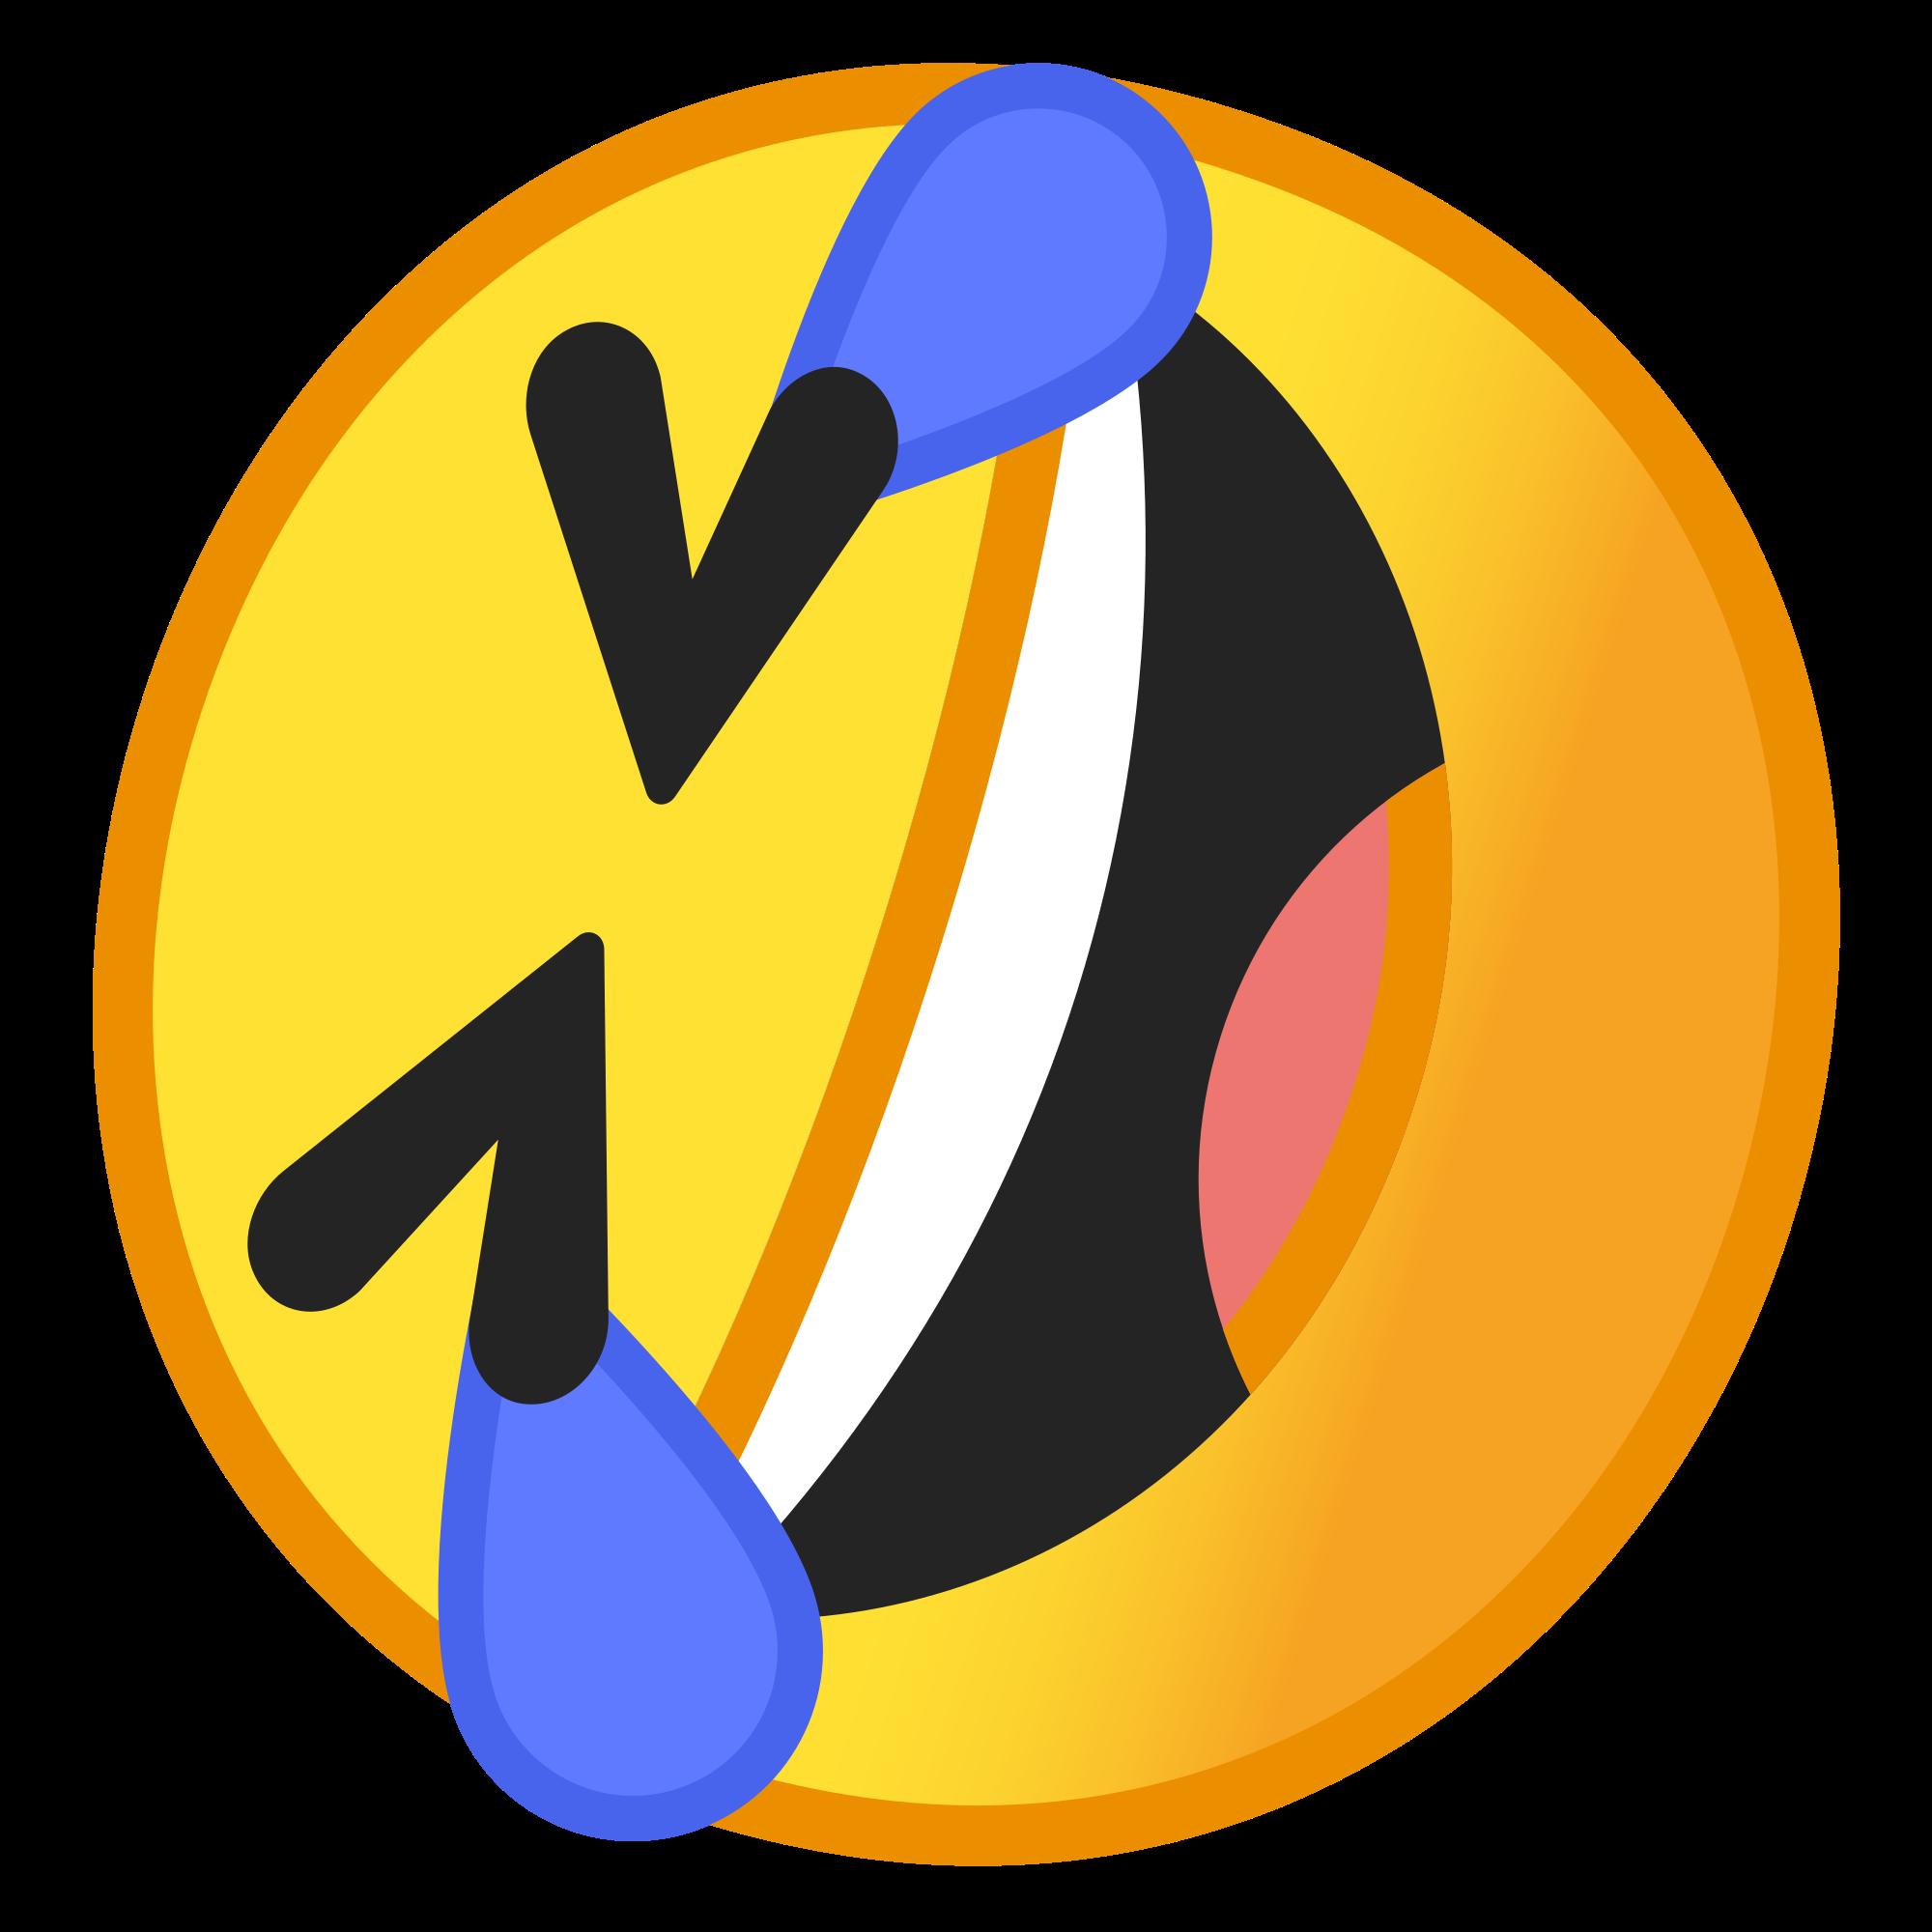 Oreo clipart wiki, Oreo wiki Transparent FREE for download.